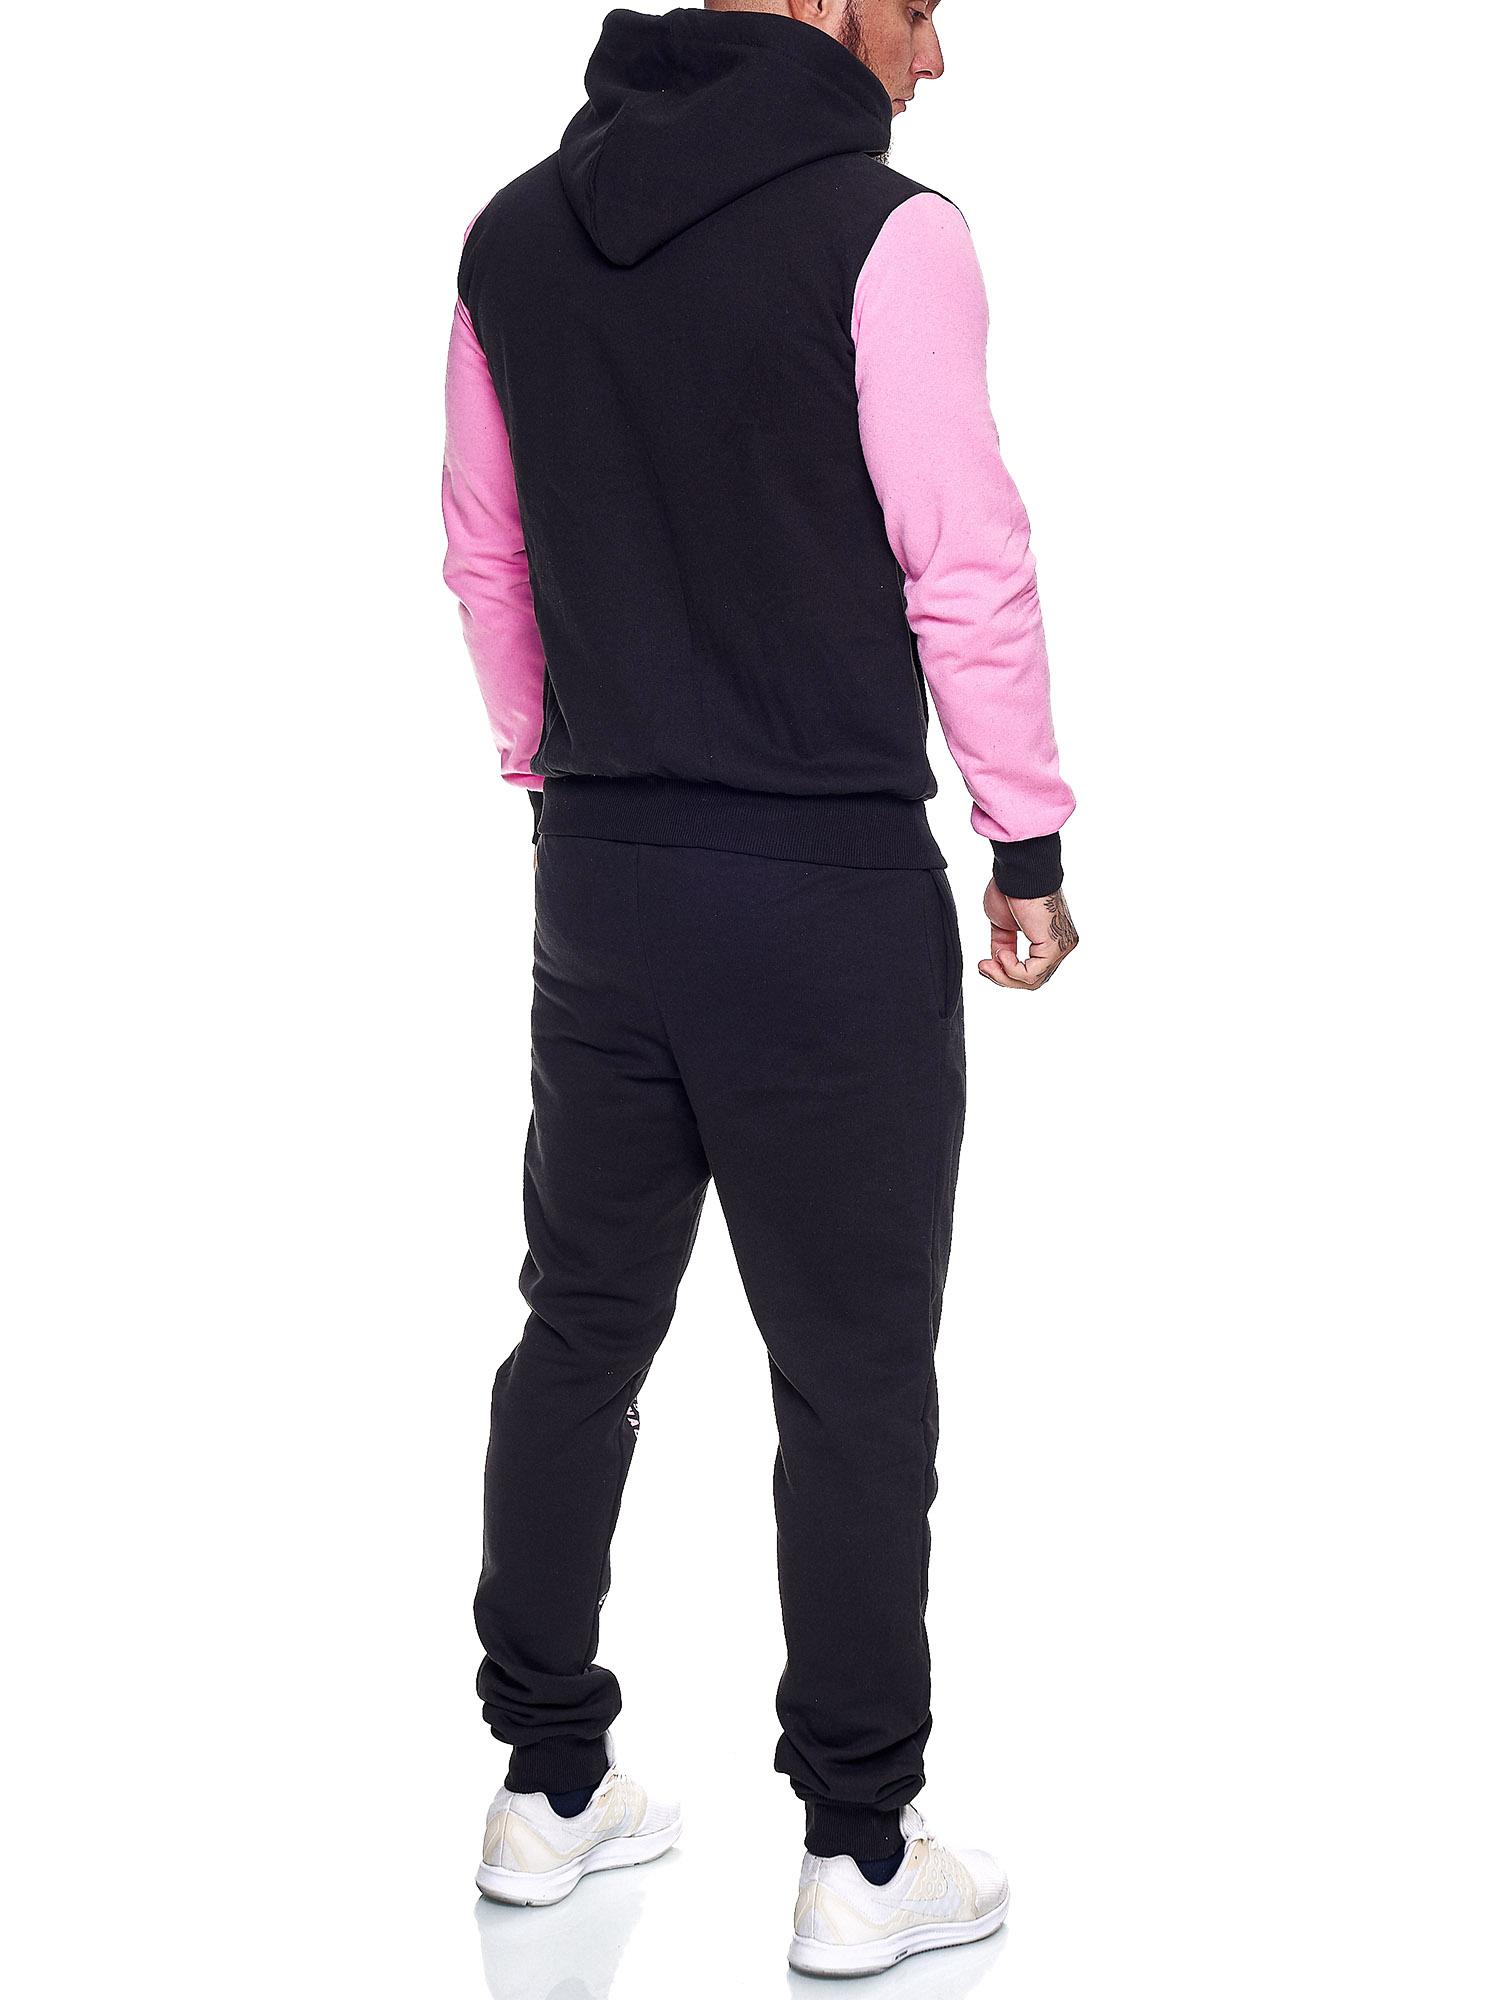 Damen-Jogginganzug-Frauen-Trainingsanzug-Sportanzug-Streetwear-JG-512-John-Kayna Indexbild 39